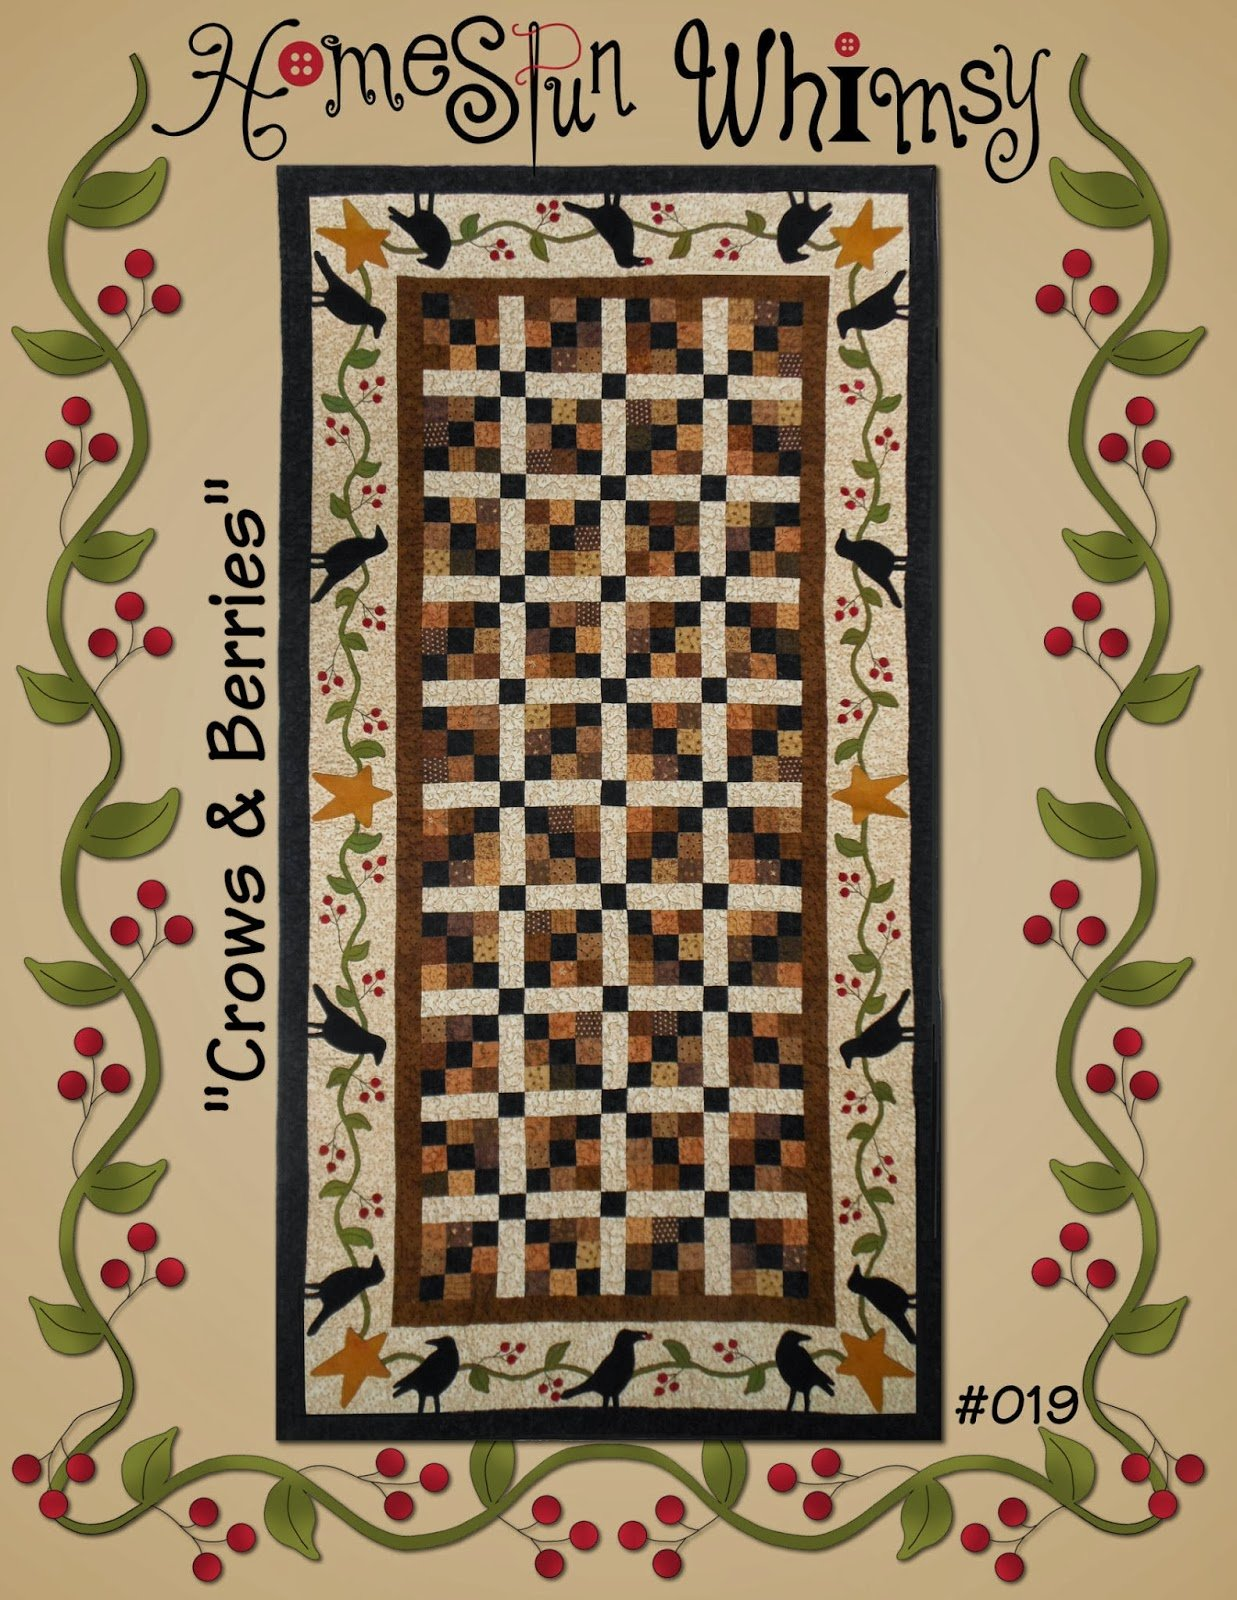 Crows & Berries Runner Pattern by Lori of Homespun Whimsy